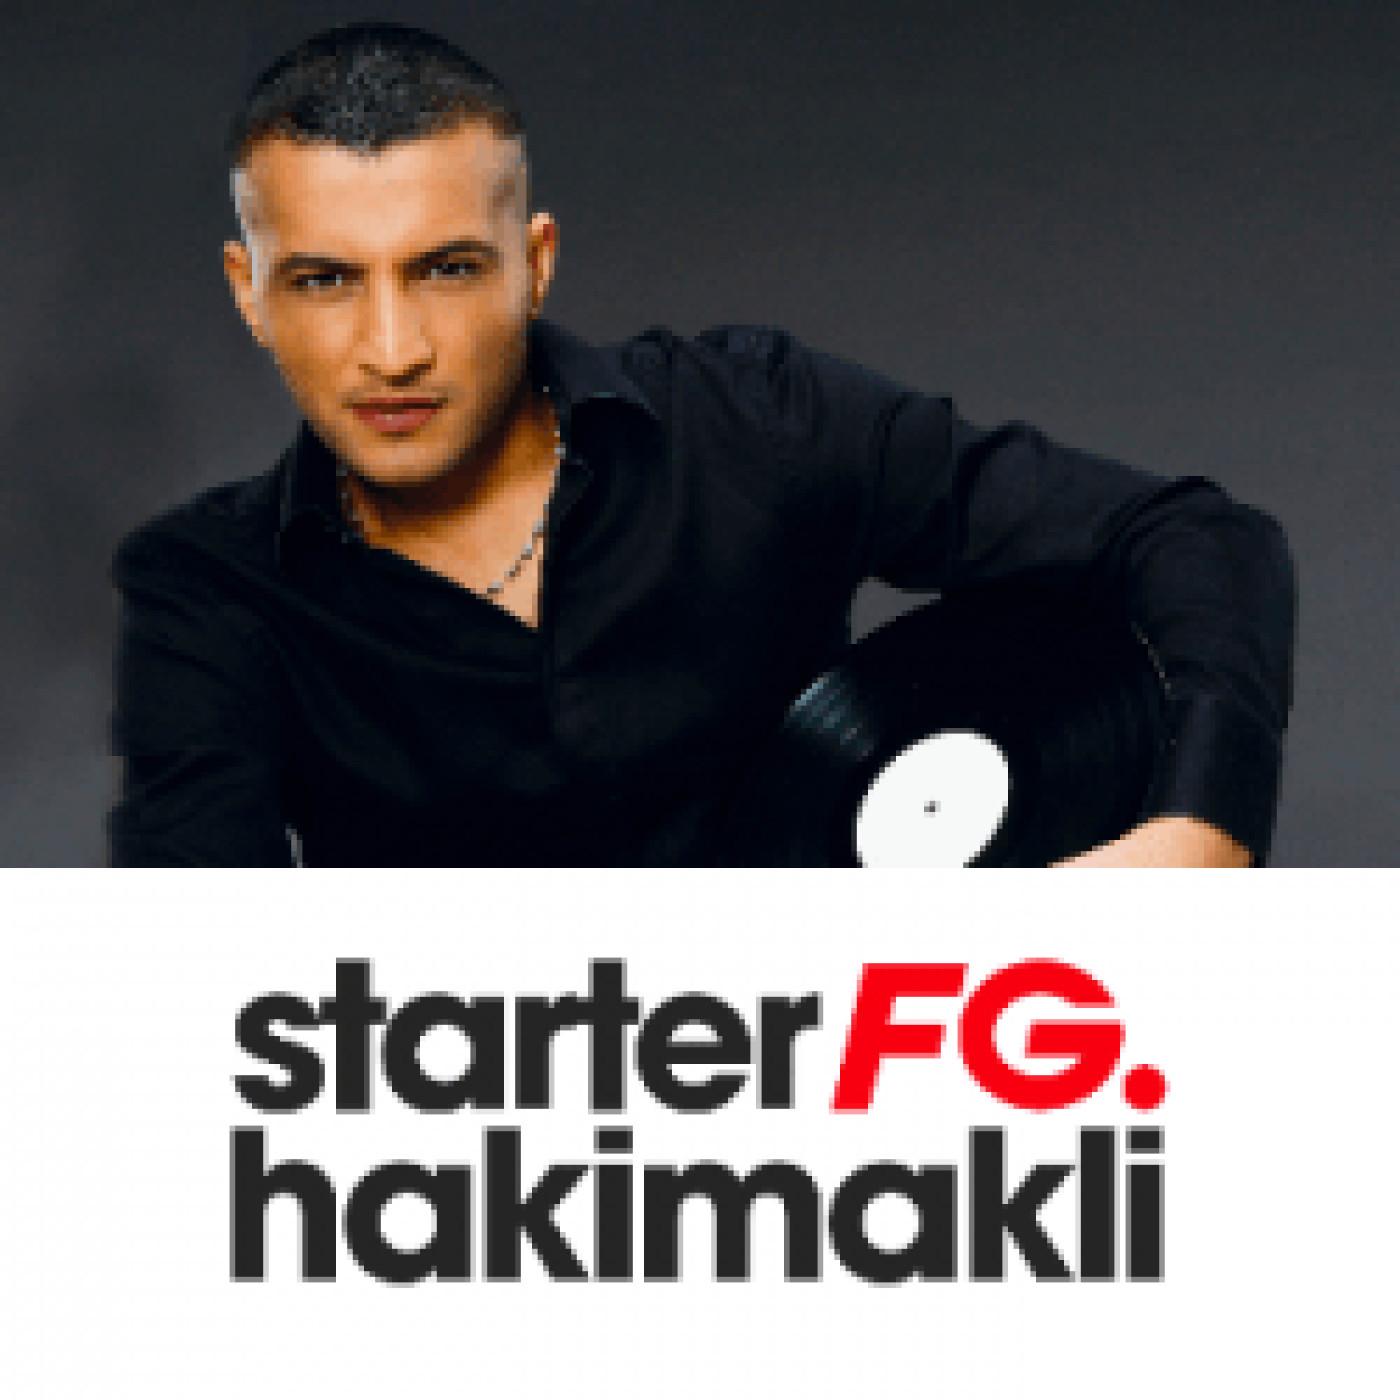 STARTER FG BY HAKIMAKLI MERCREDI 28 OCTOBRE 2020